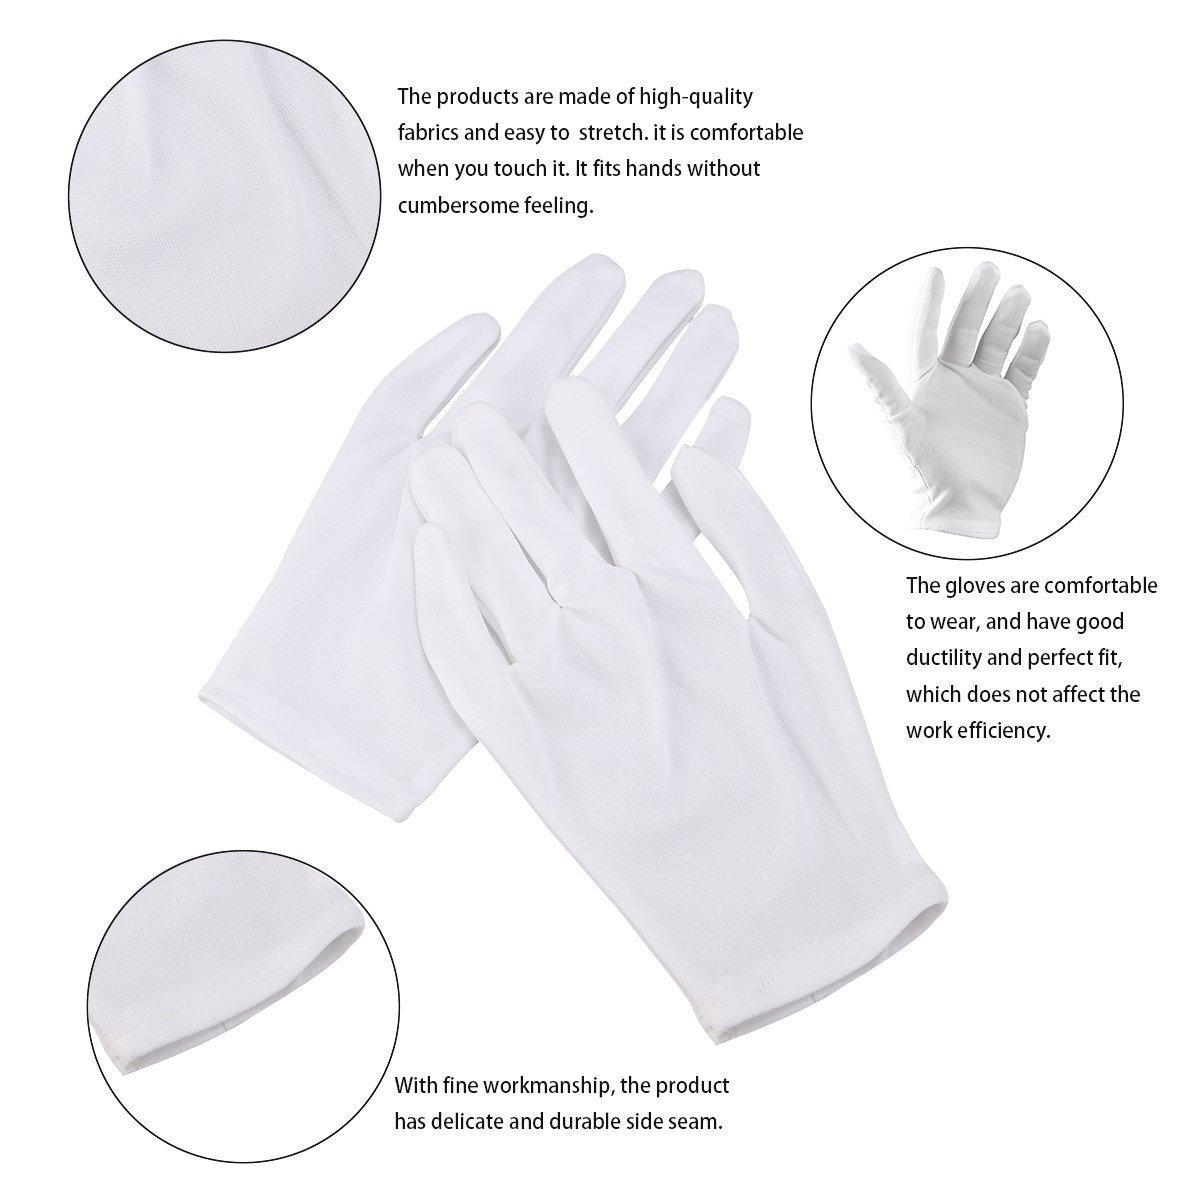 CTK White Soft 100% Cotton Work/Lining